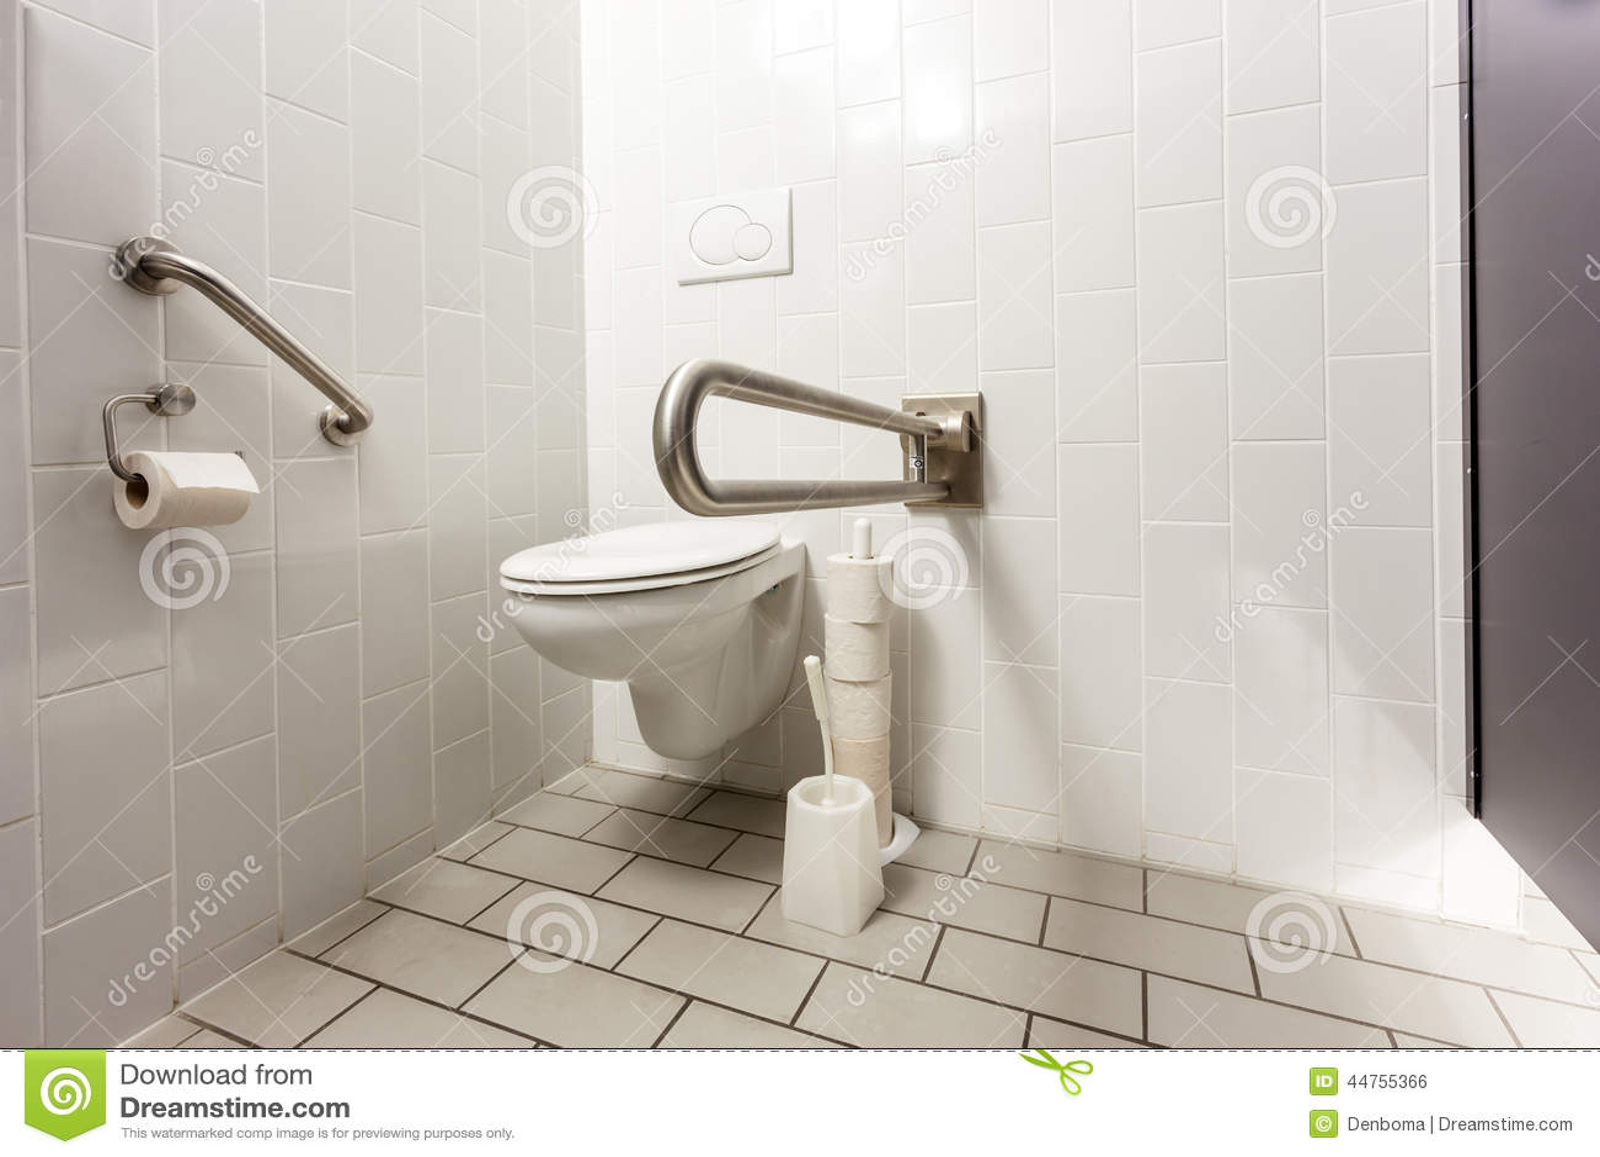 Vertical Toilet Paper Holder